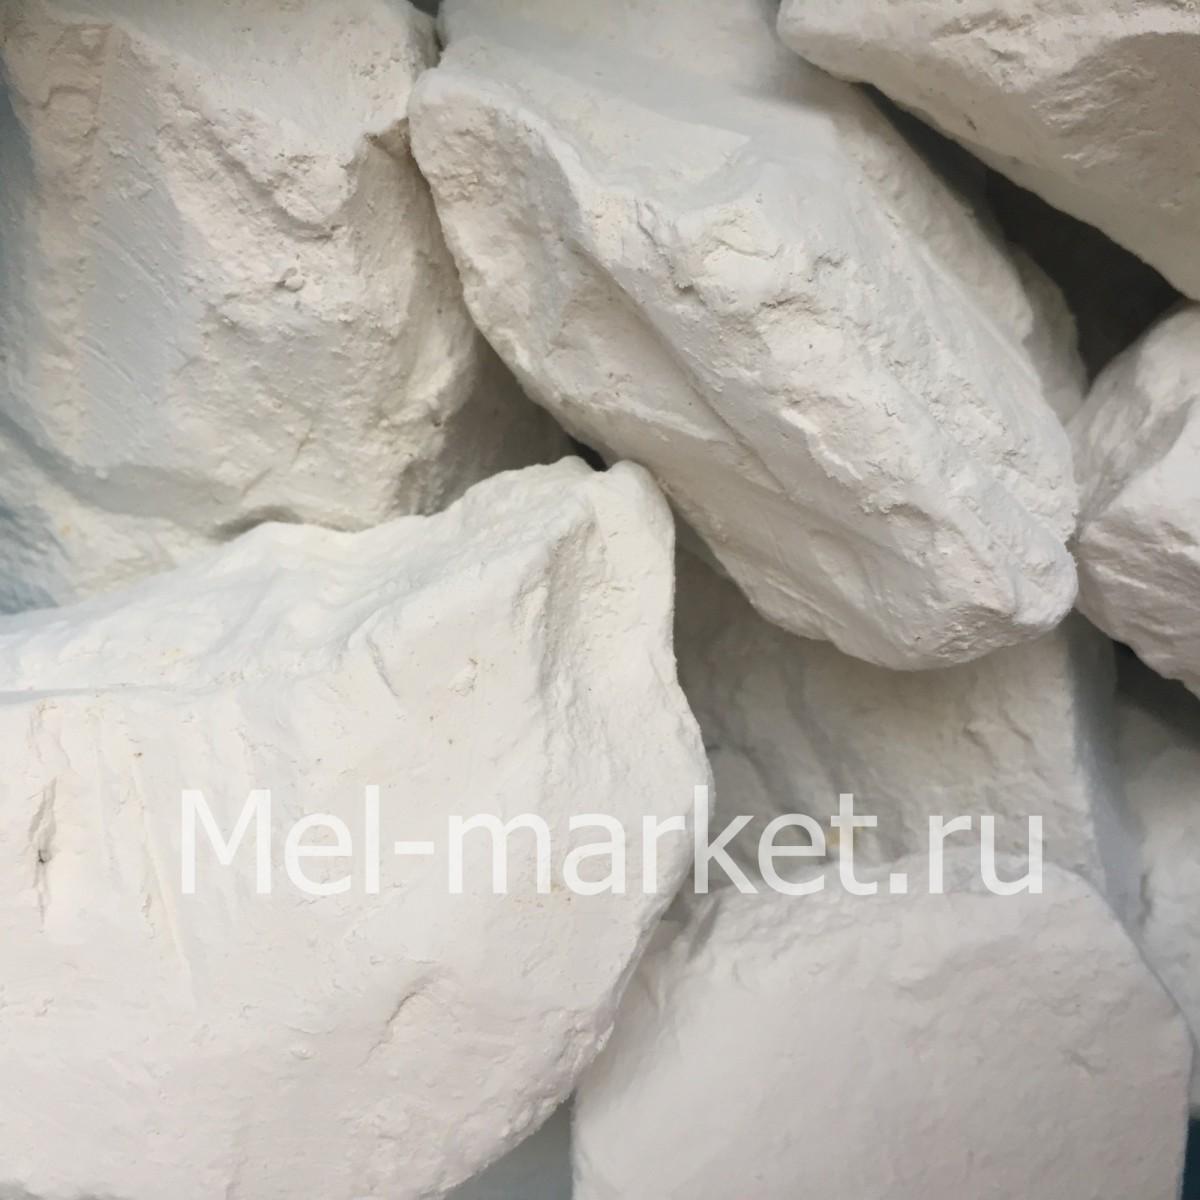 "Мел ""Новый Оскол"" - 1кг"